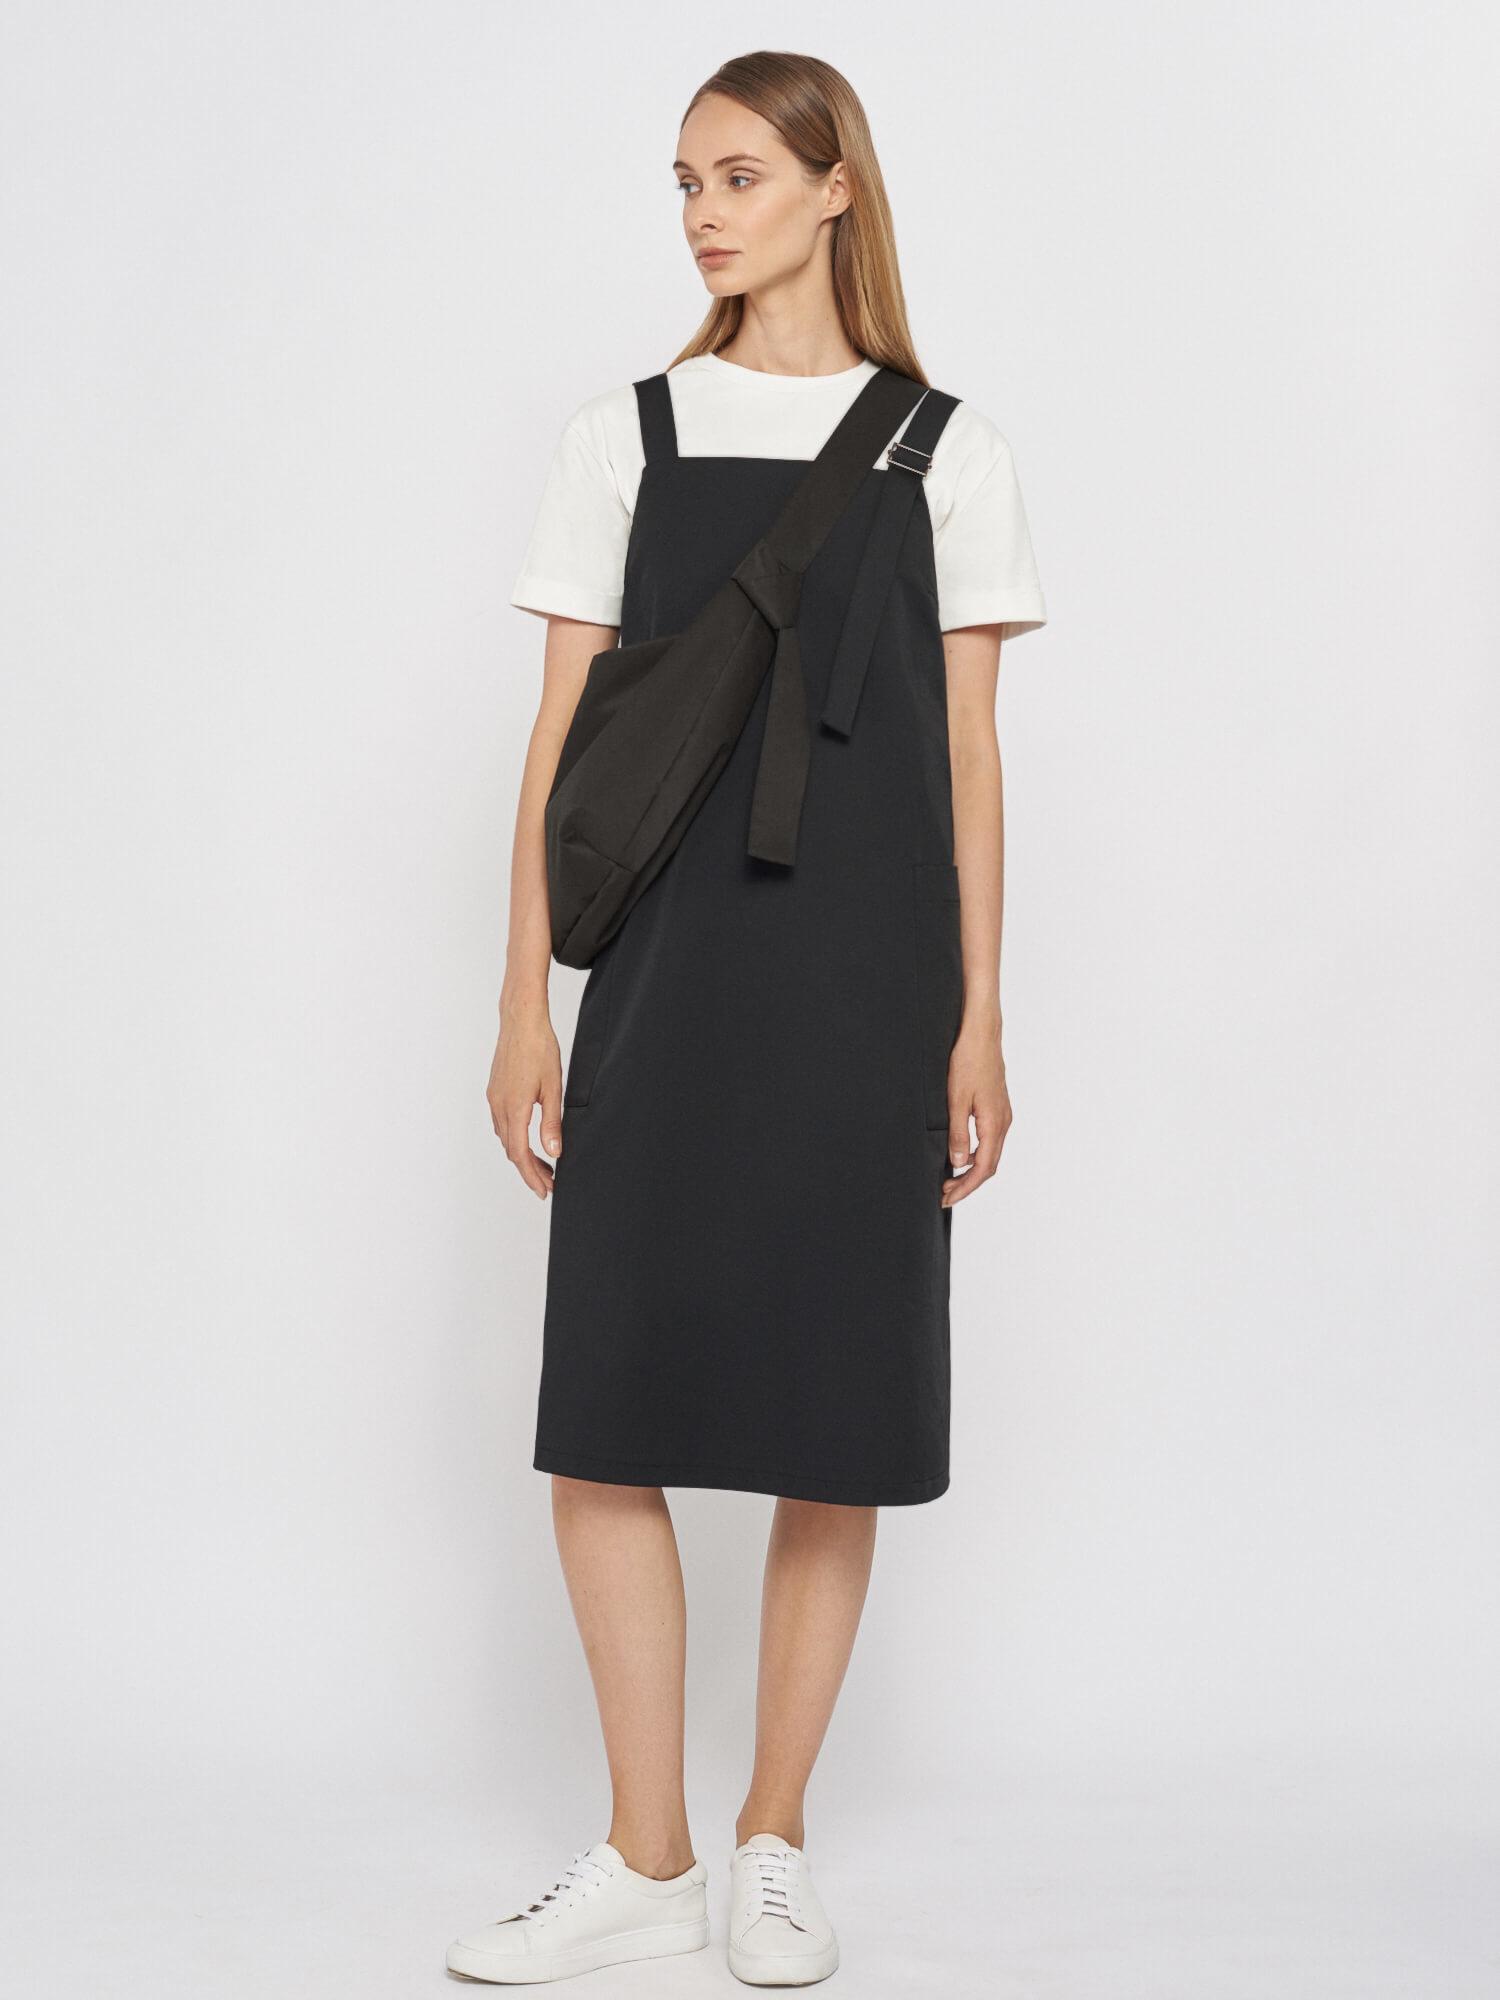 Платье-сарафан Jennifer на бретелях, Черный